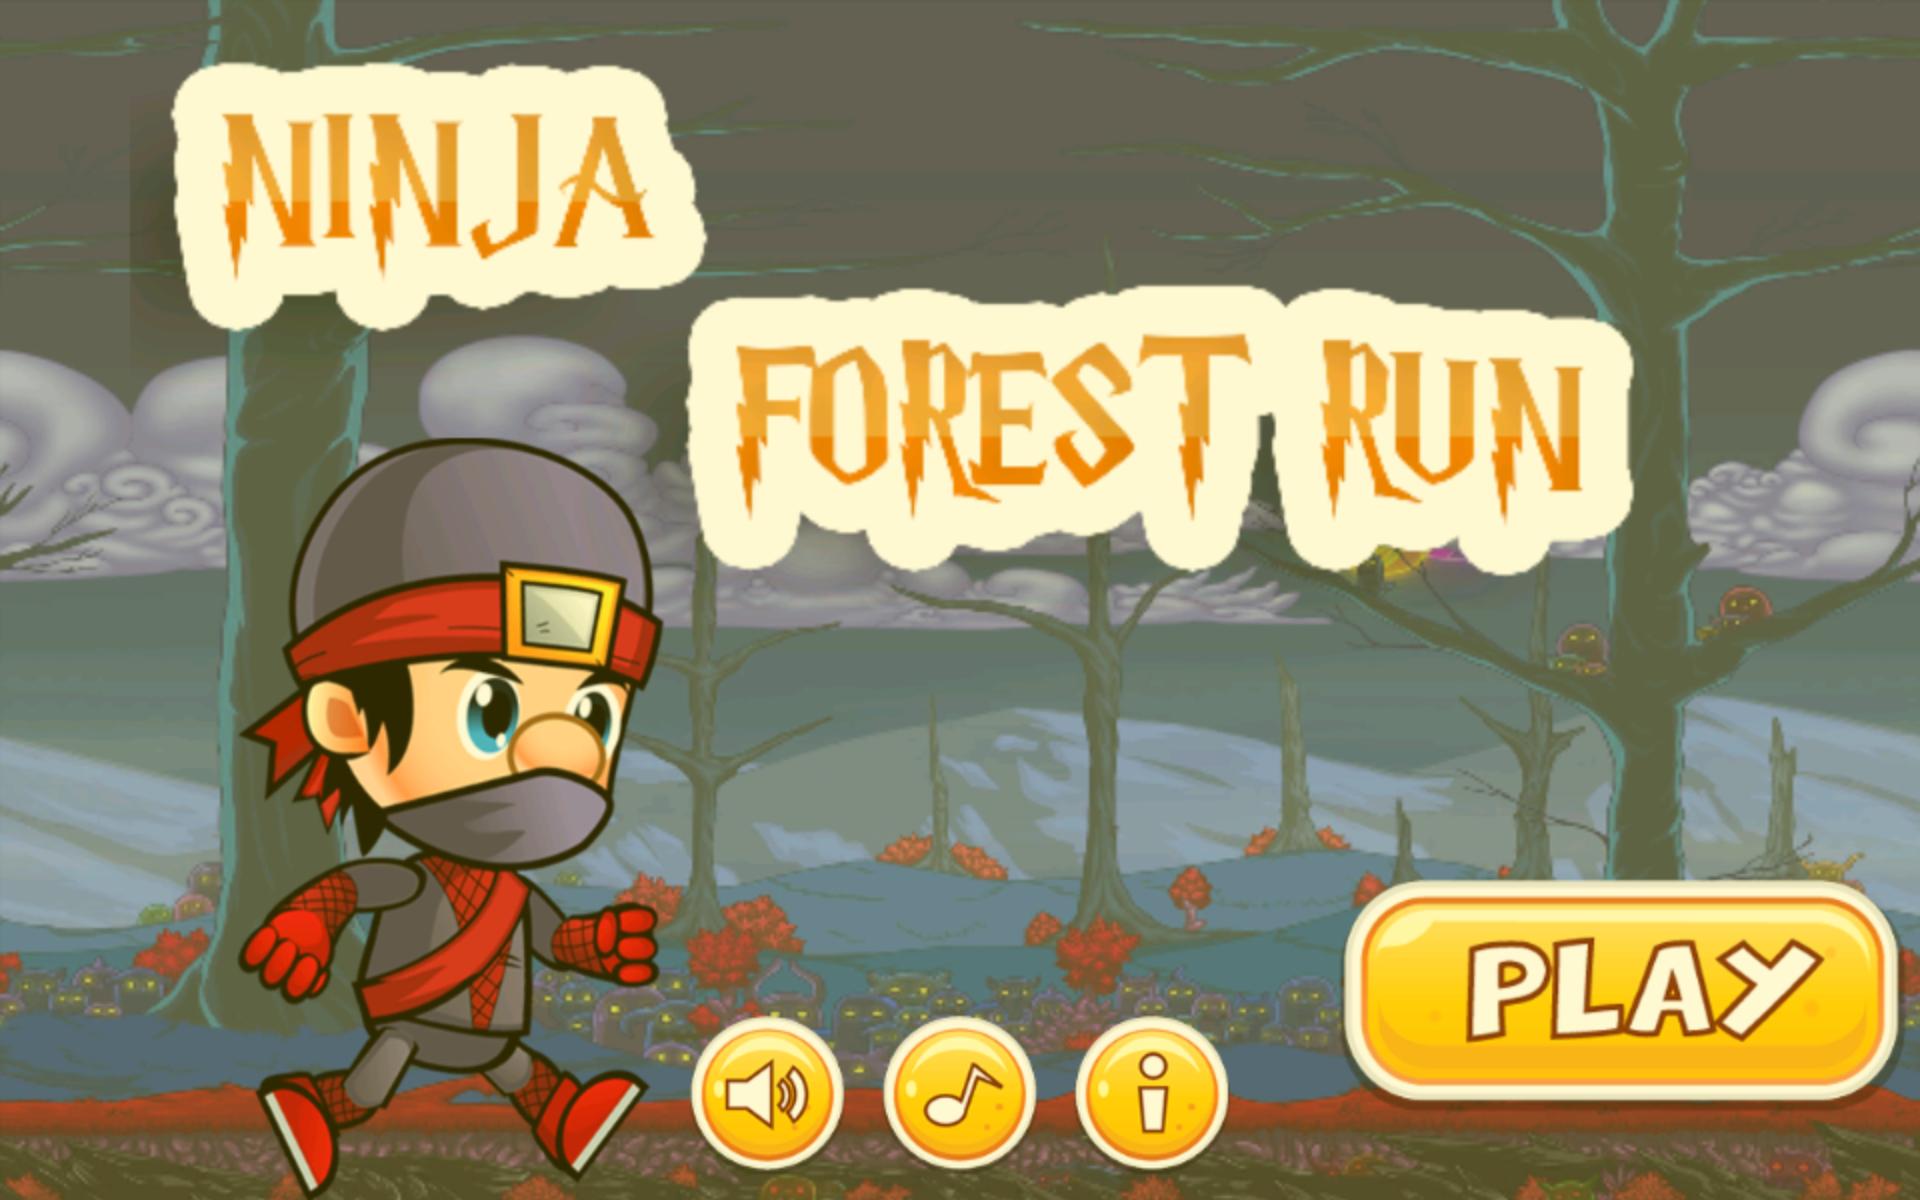 Ninja Forest Run: Amazon.es: Appstore para Android